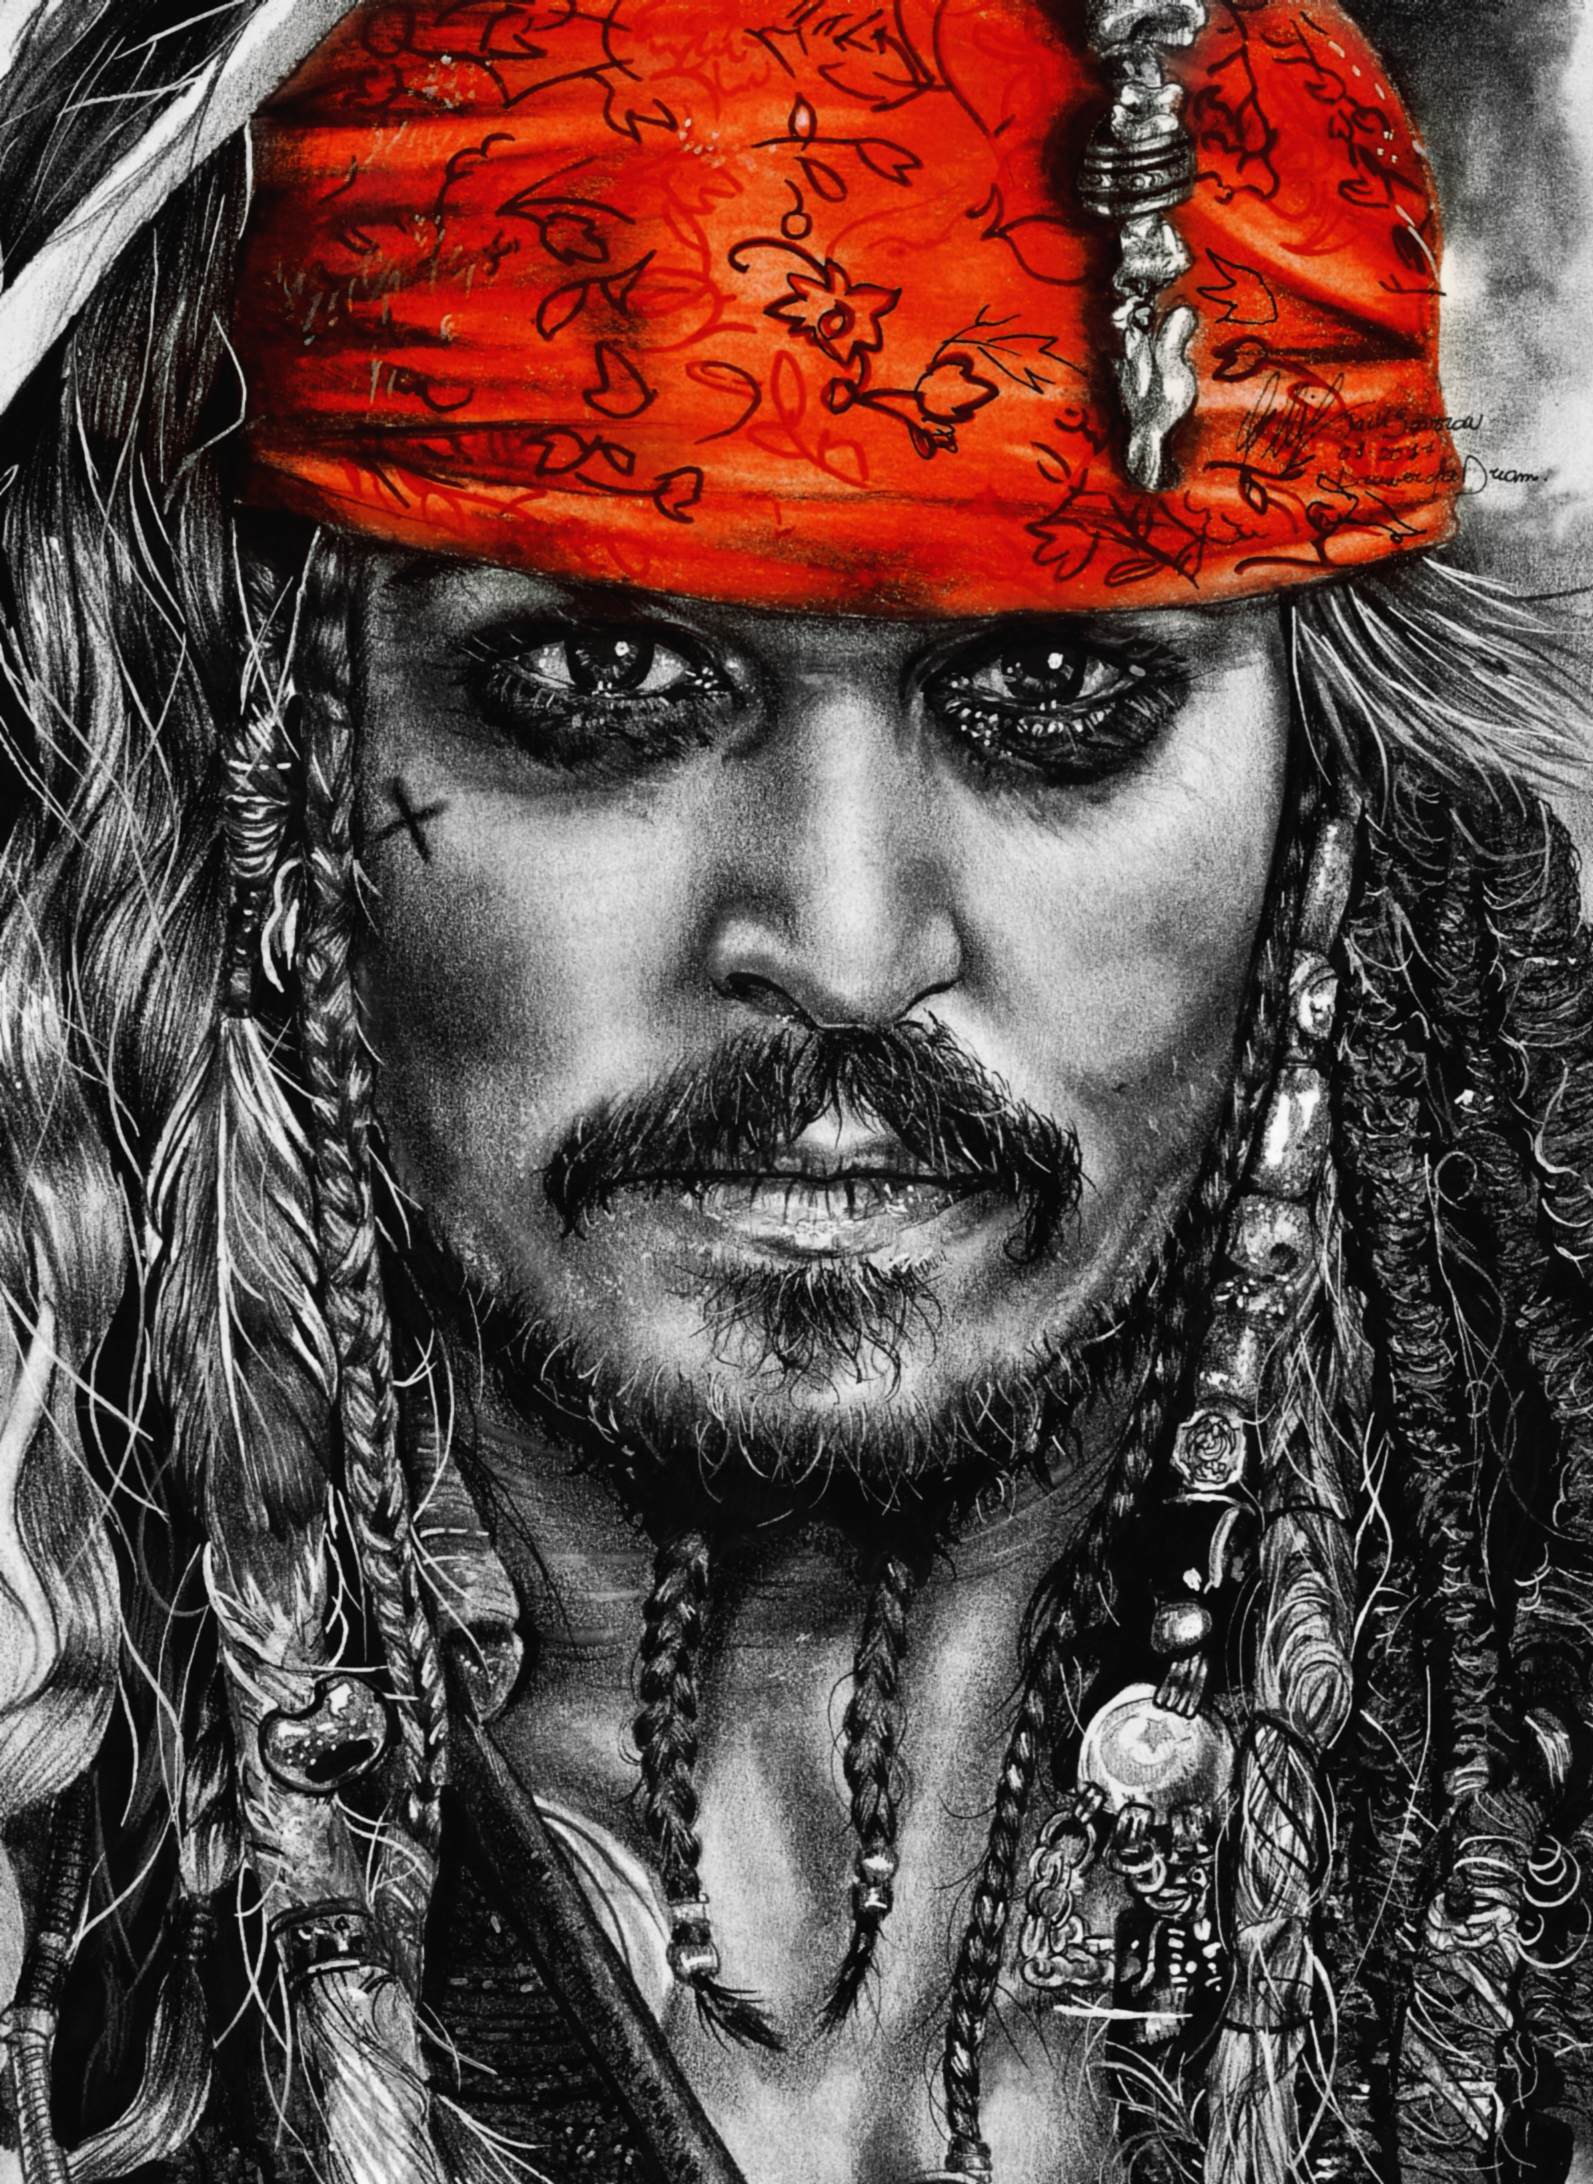 Jacksparrow Piratesofcarabean Johnnydepp Art Portrait